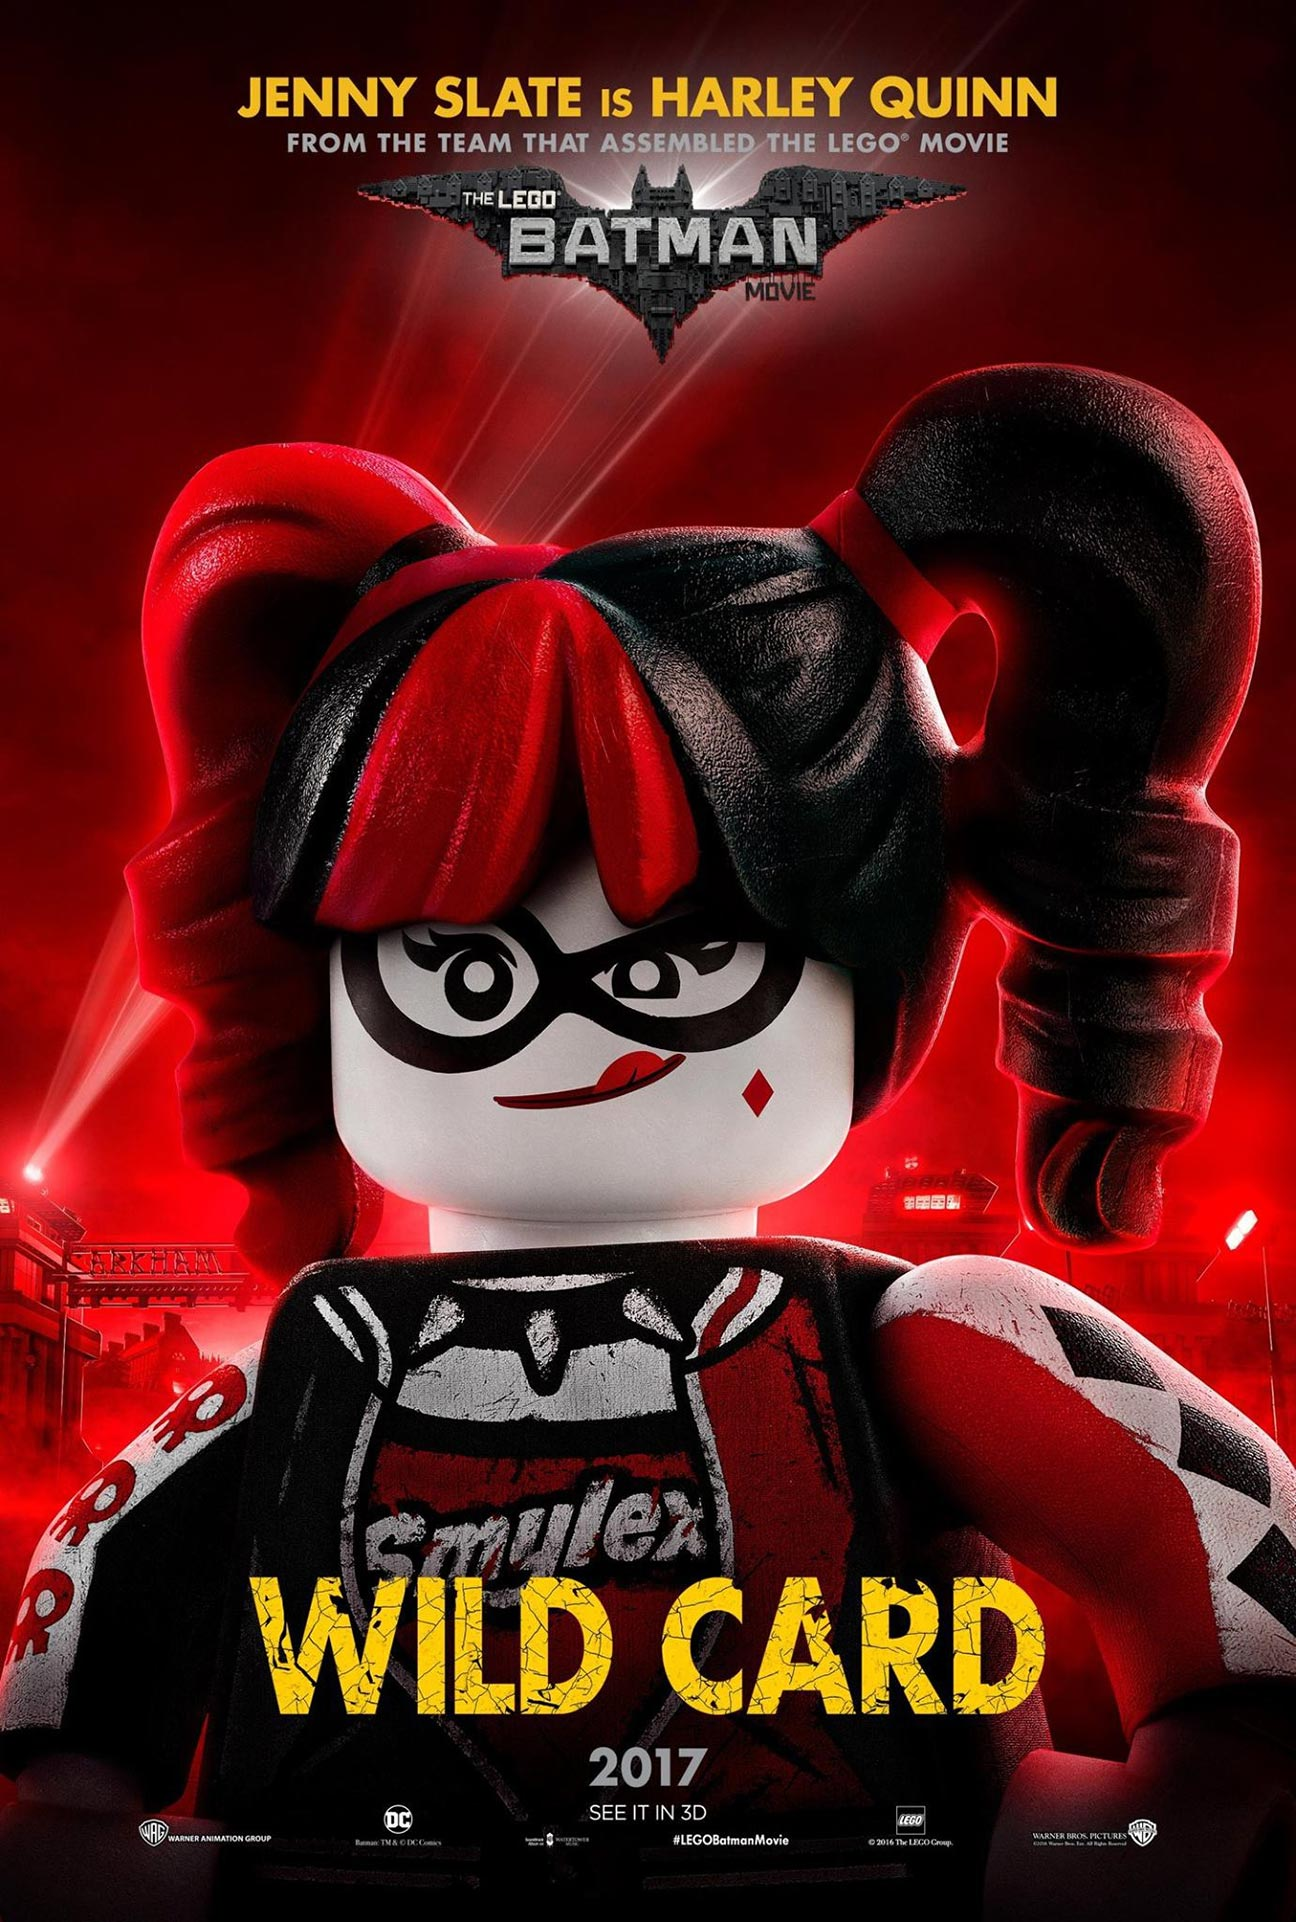 The Lego Batman Movie Poster #11